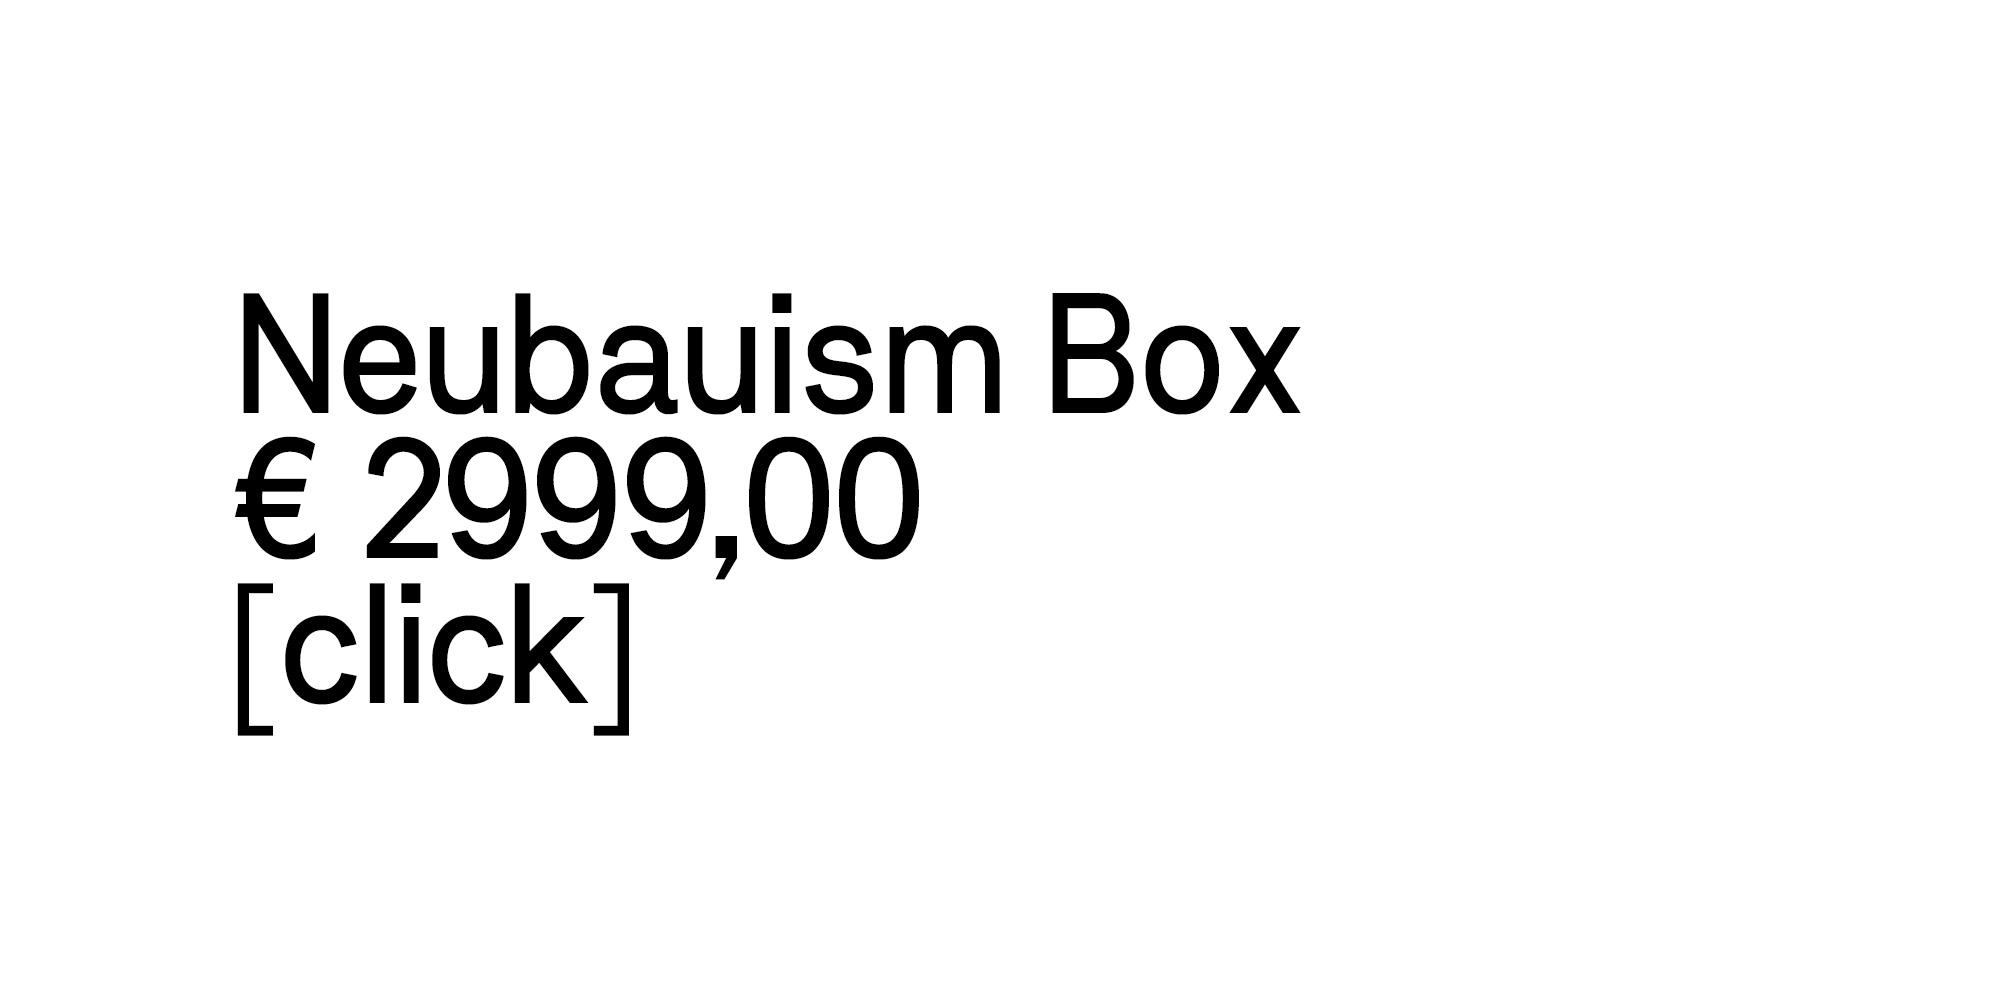 NBL-NeubauismBox